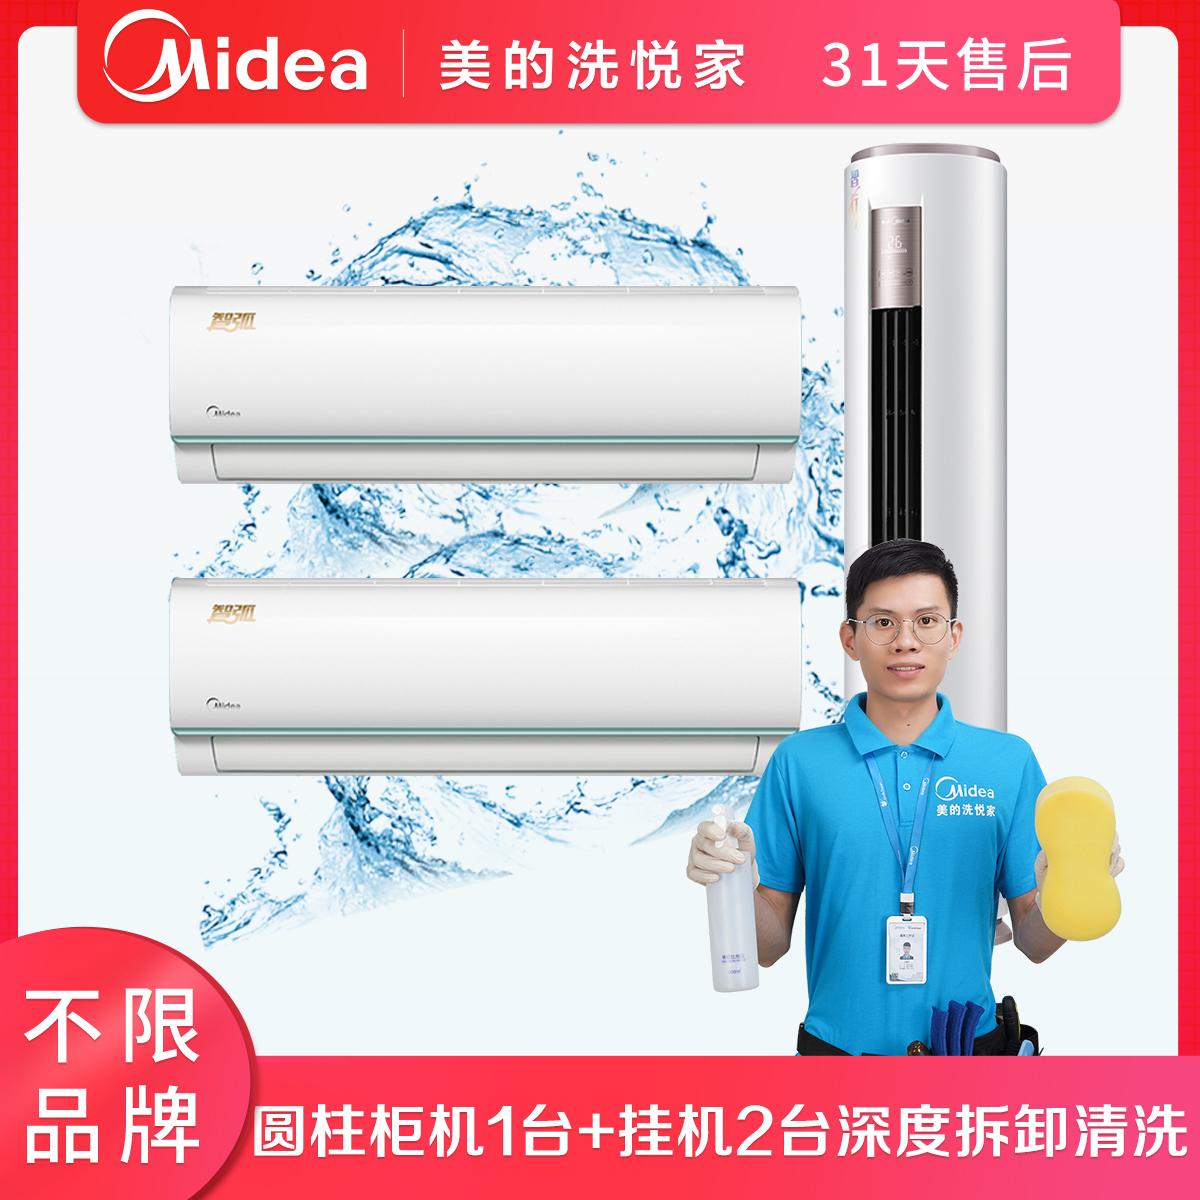 Midea/美的 空调挂机2台+圆柱柜机1台清洗上门服务清洗服务 说明书.pdf